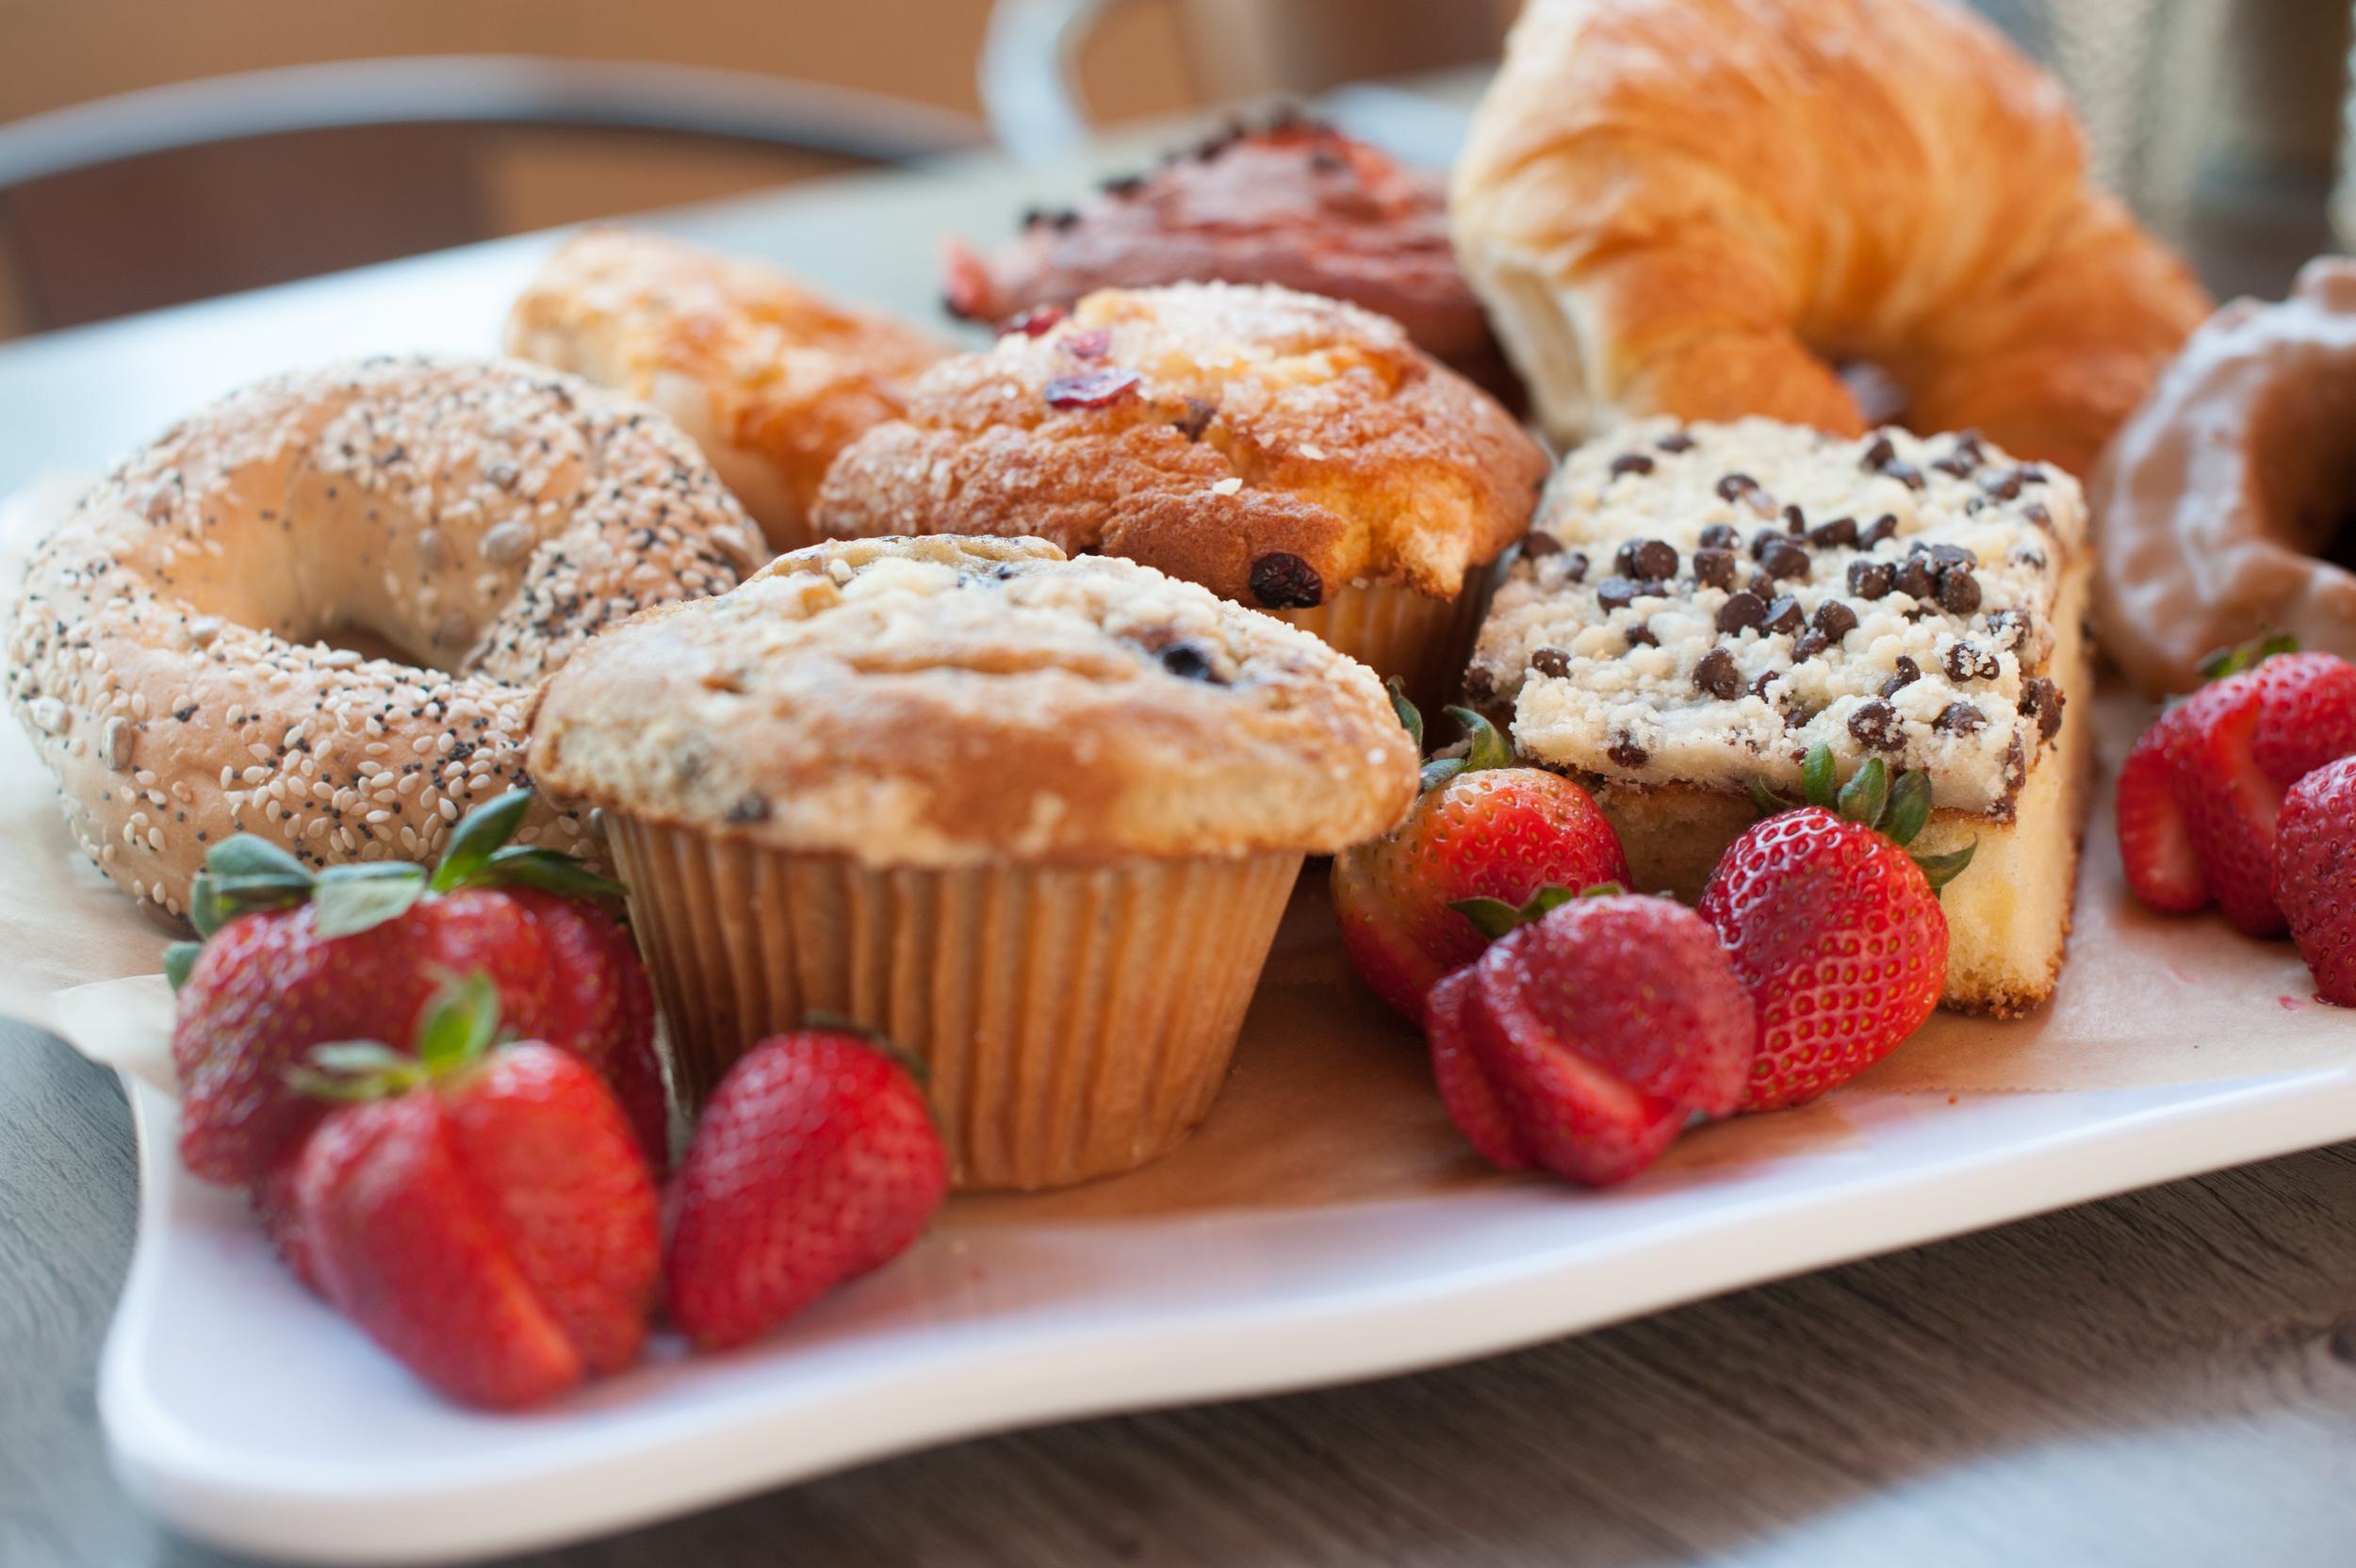 Fresh_Bakery_Items.jpg